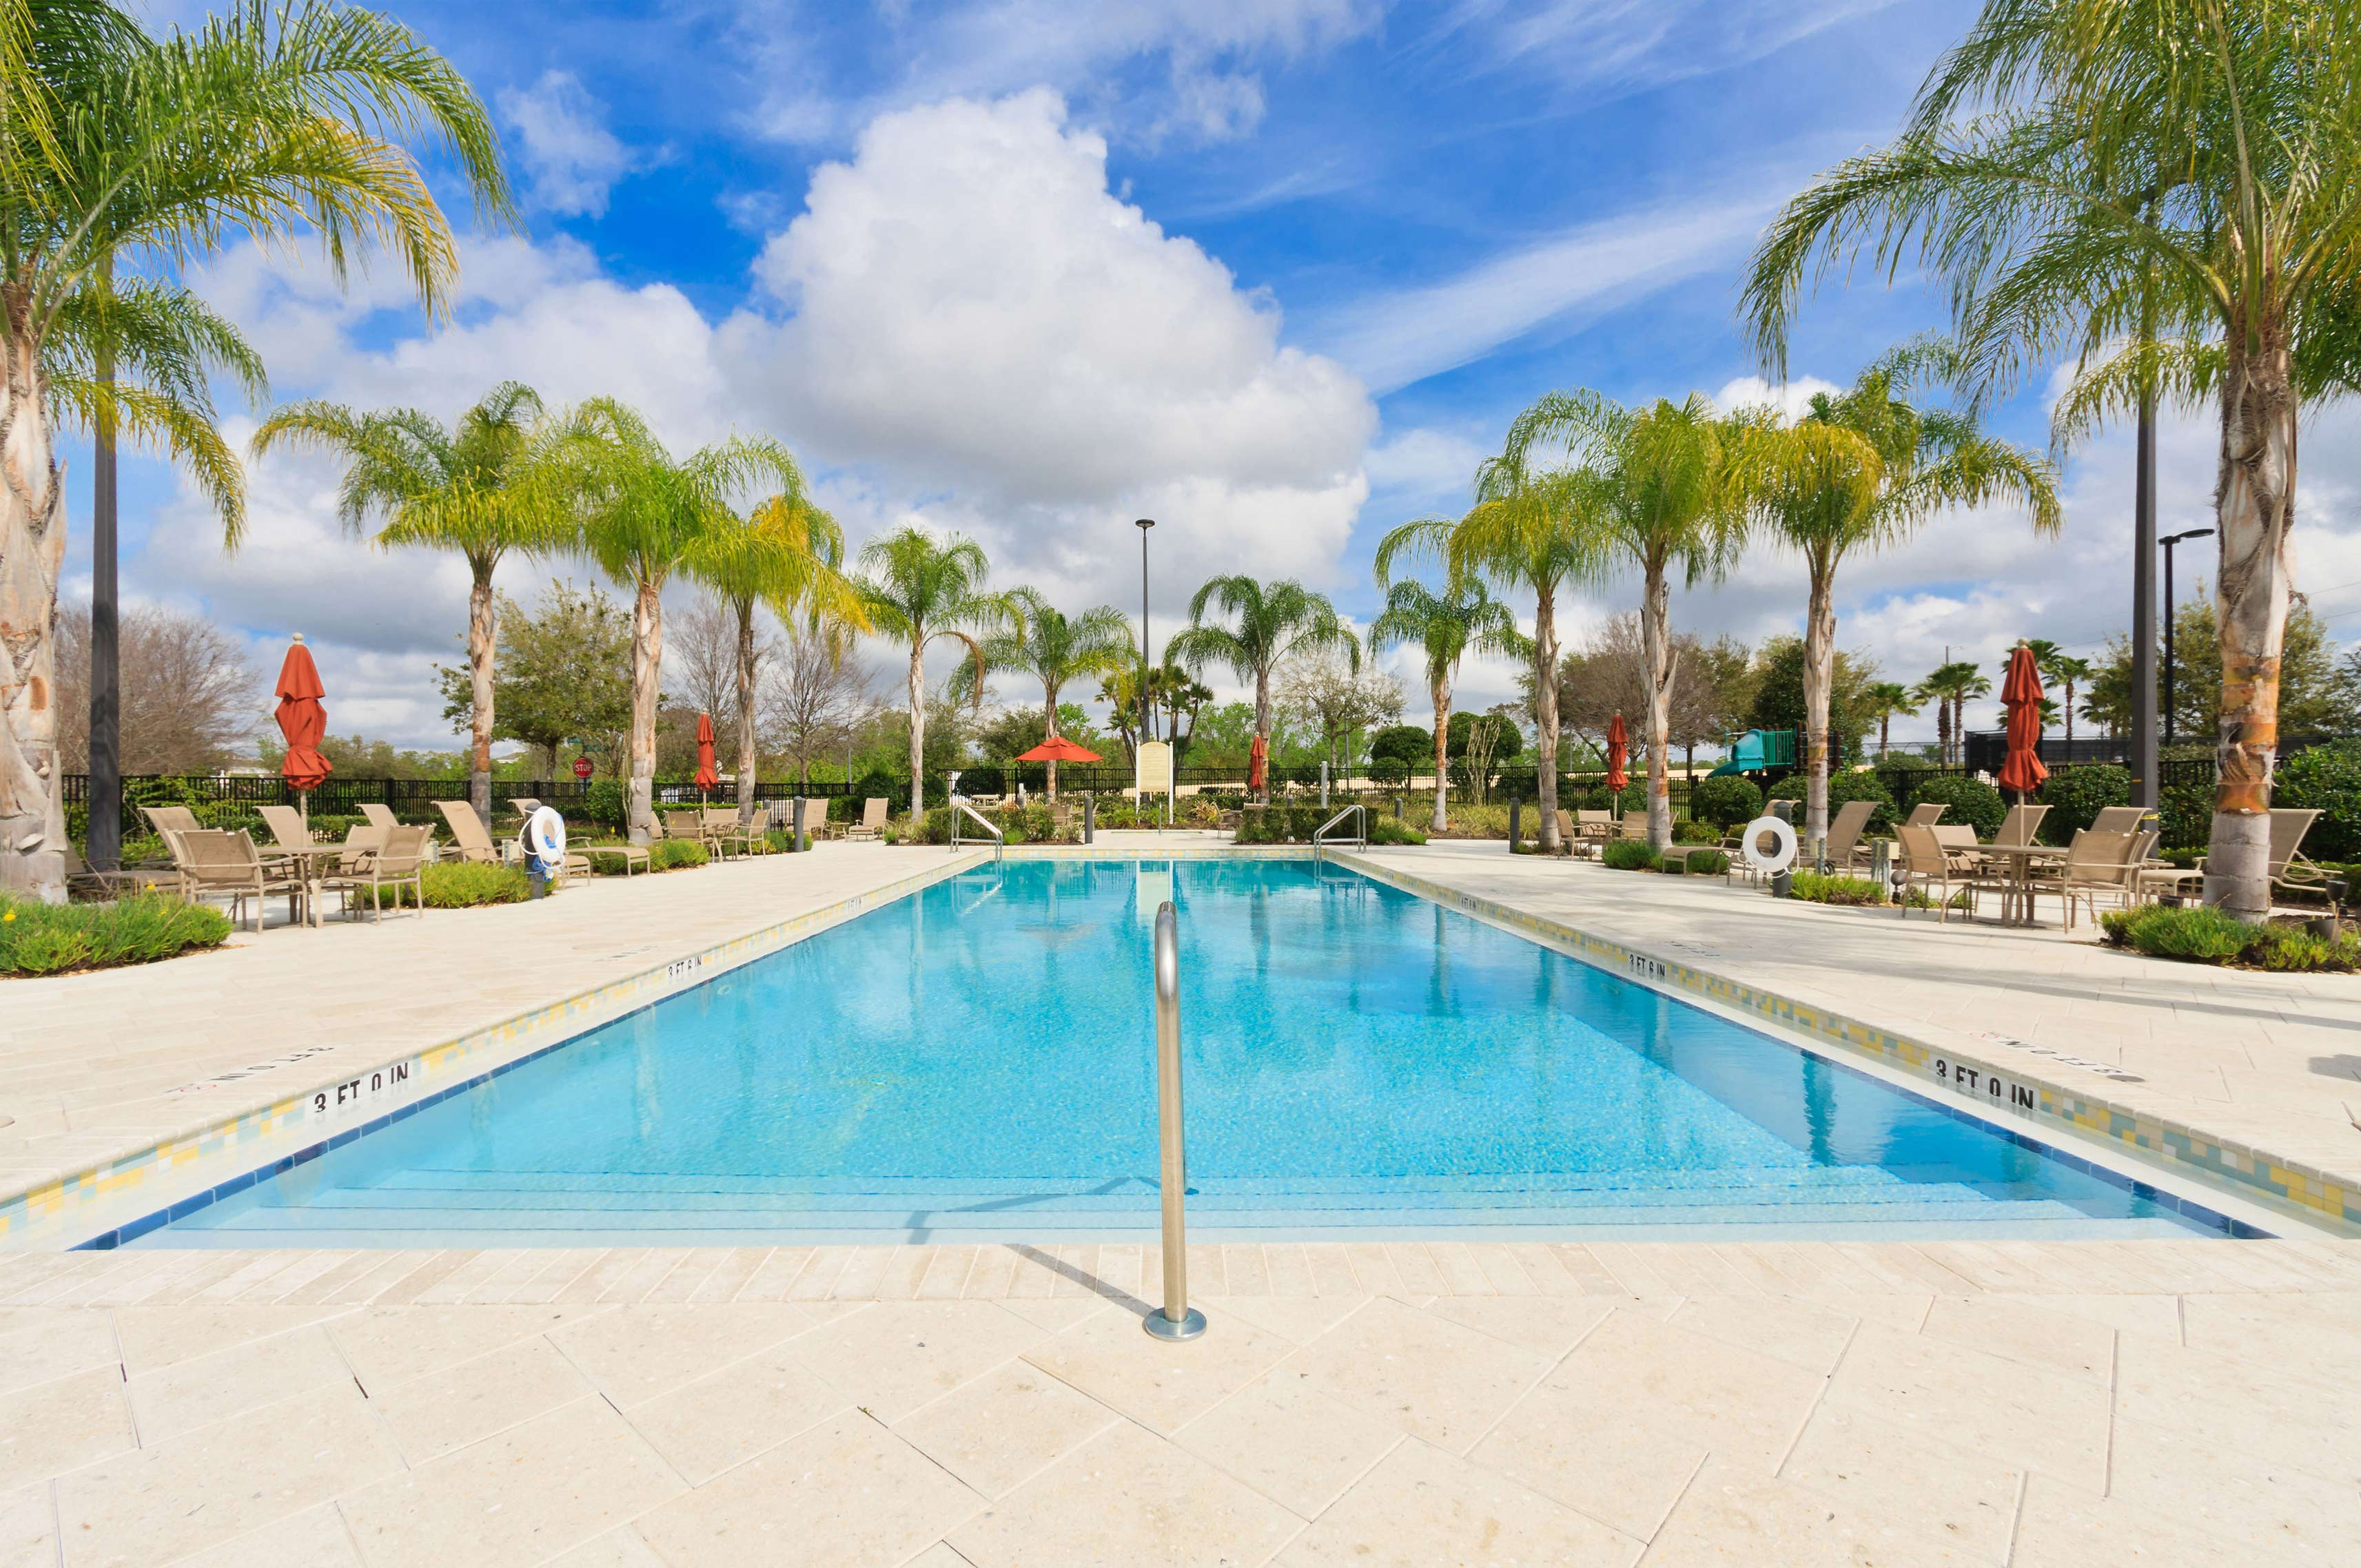 Center Court Pool 2 at Reunion Resort